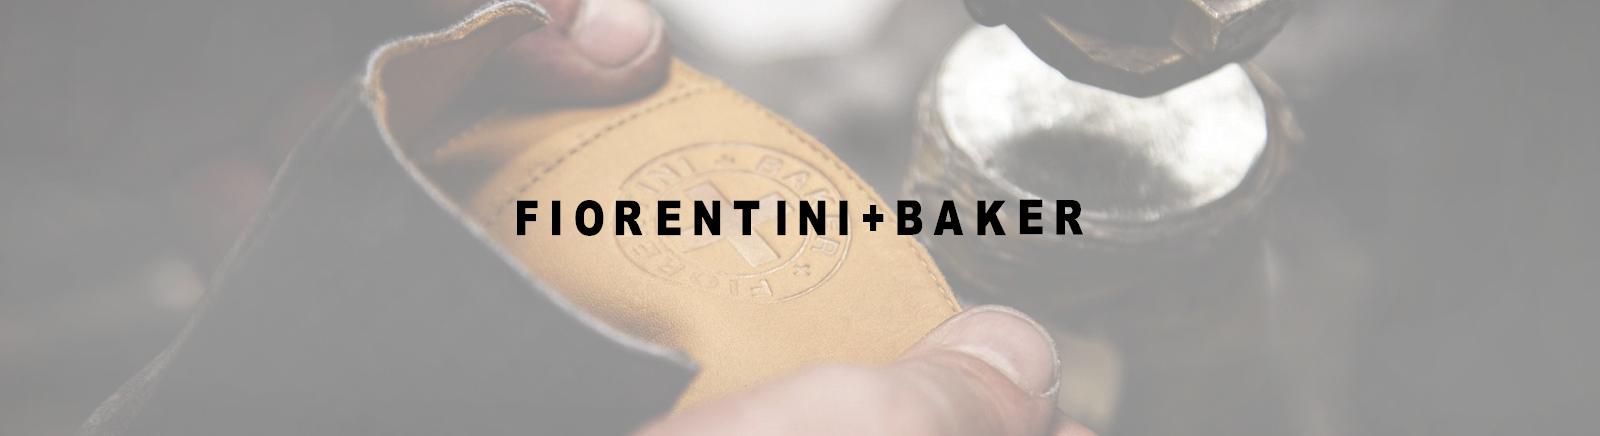 Fiorentini + Baker Damenschuhe online bestellen im Prange Schuhe Shop